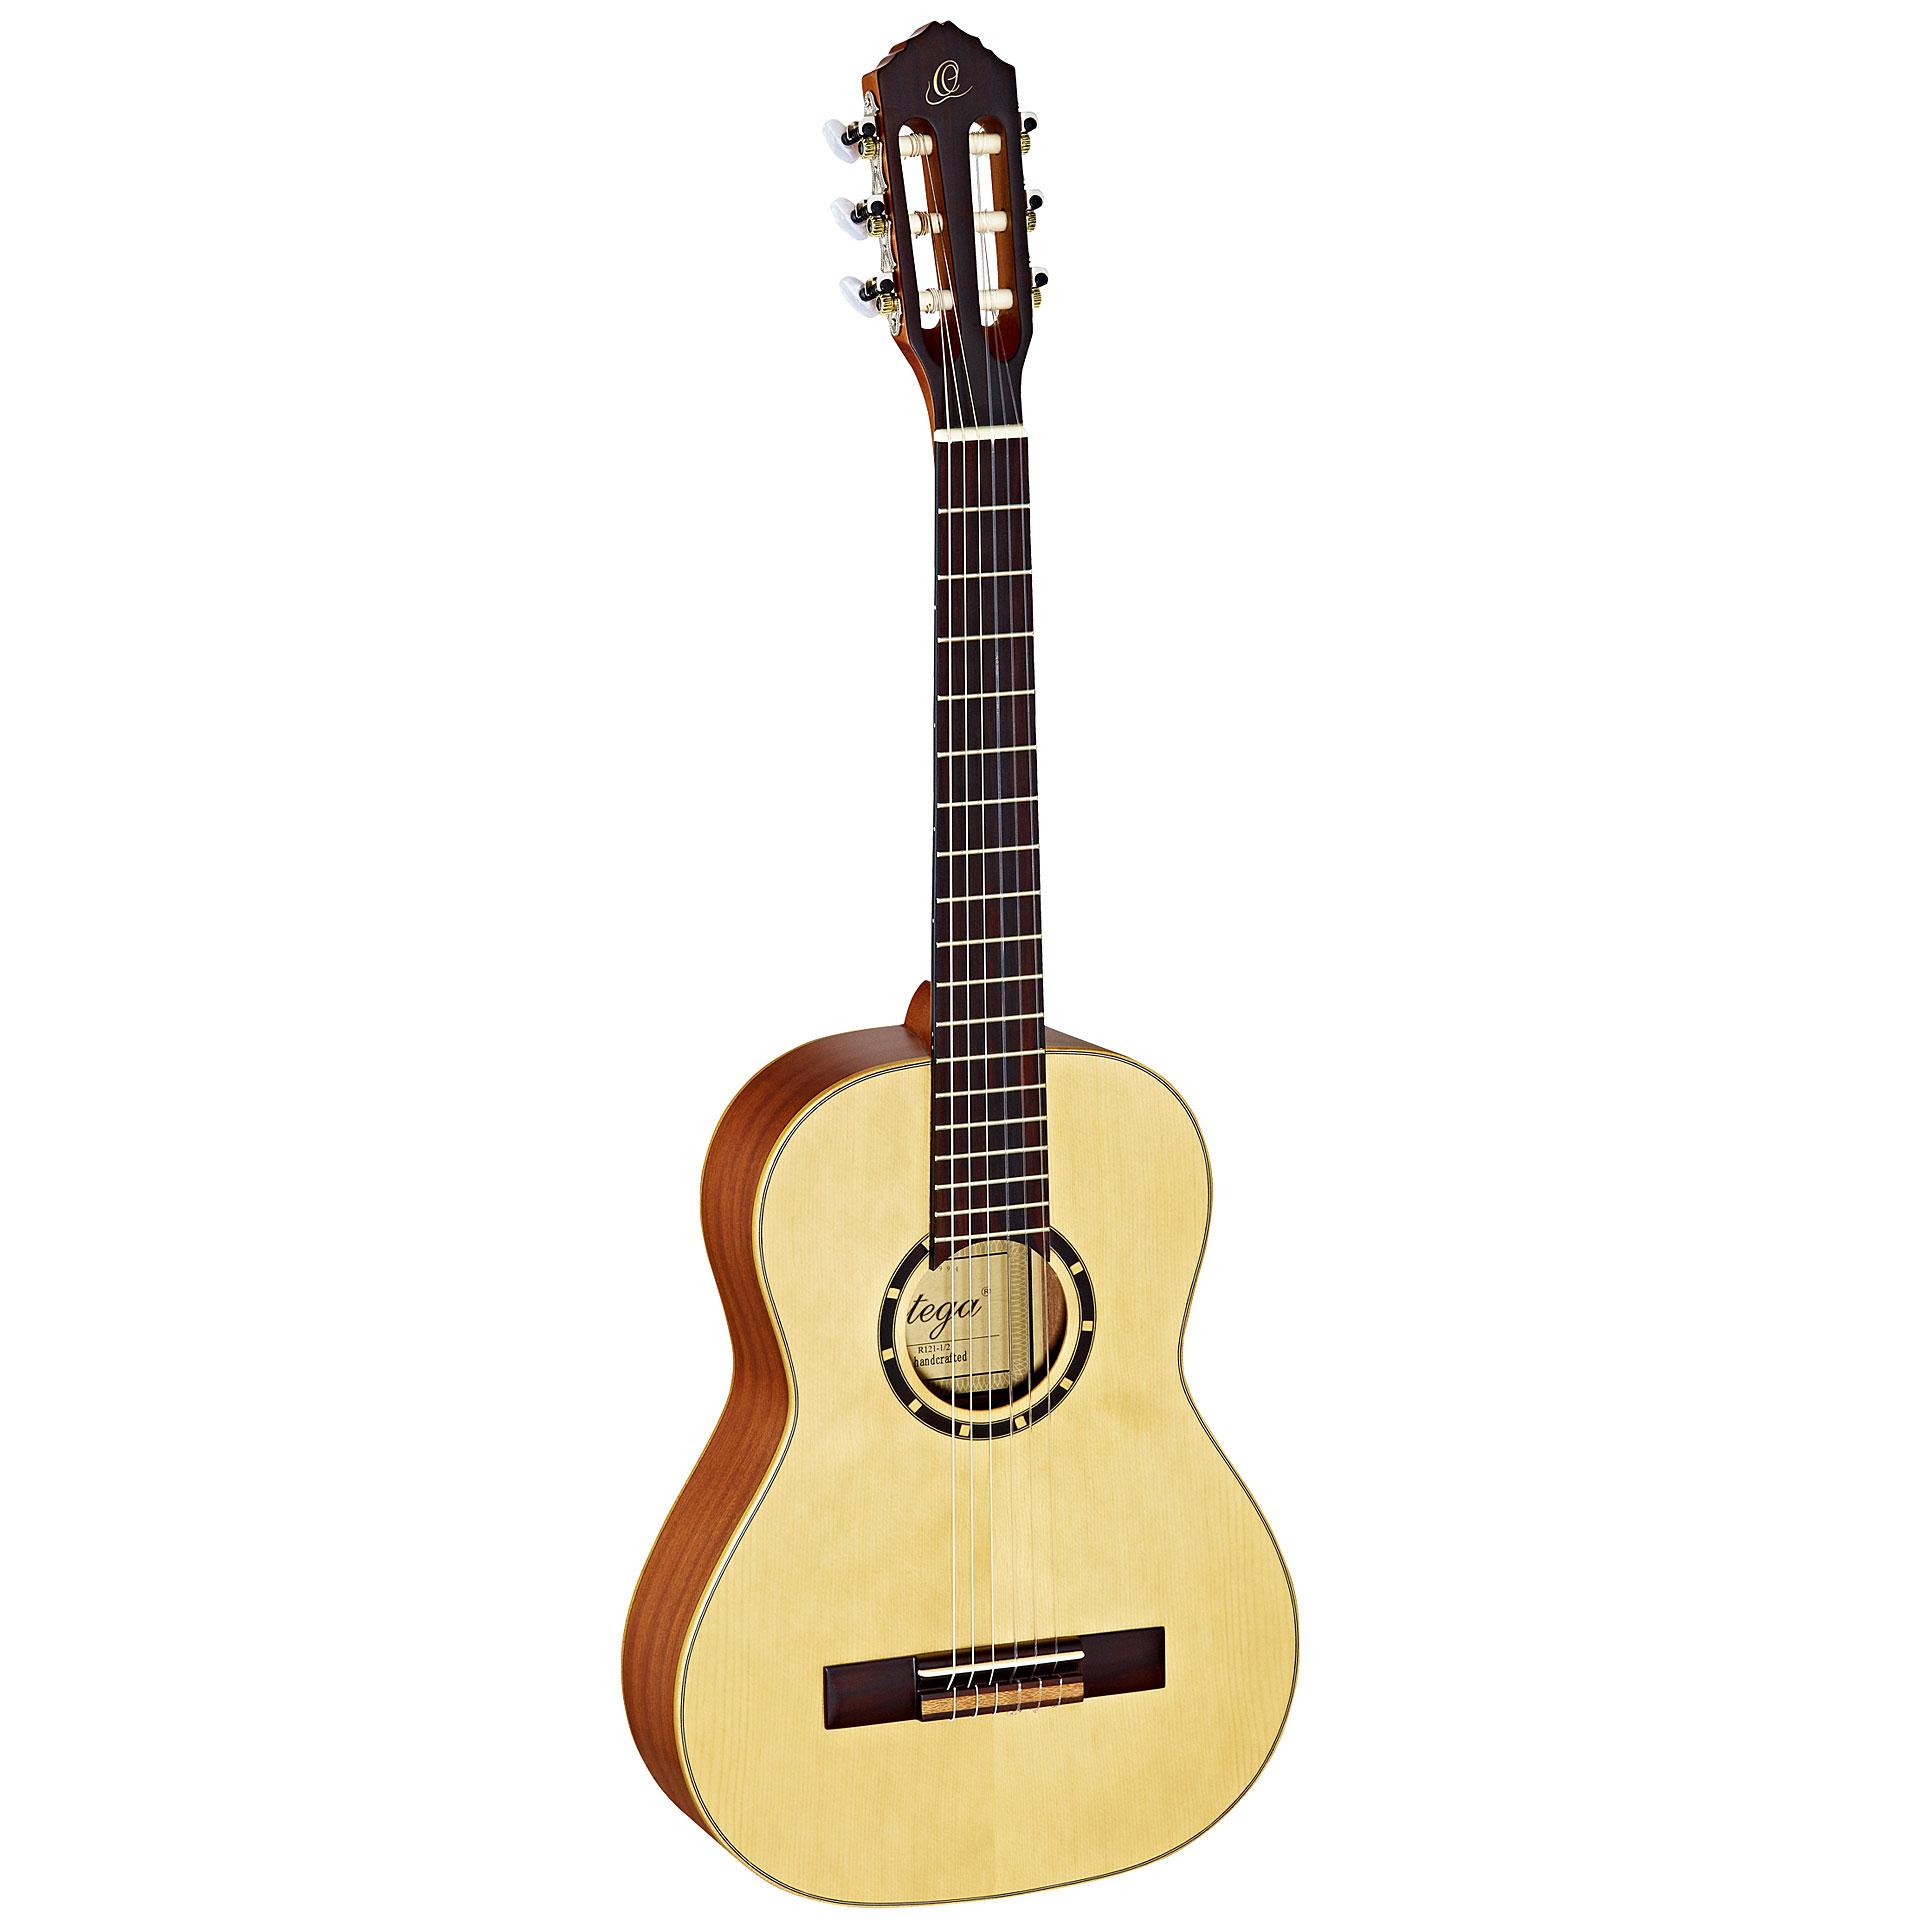 ortega r121 1 2 classical guitar. Black Bedroom Furniture Sets. Home Design Ideas